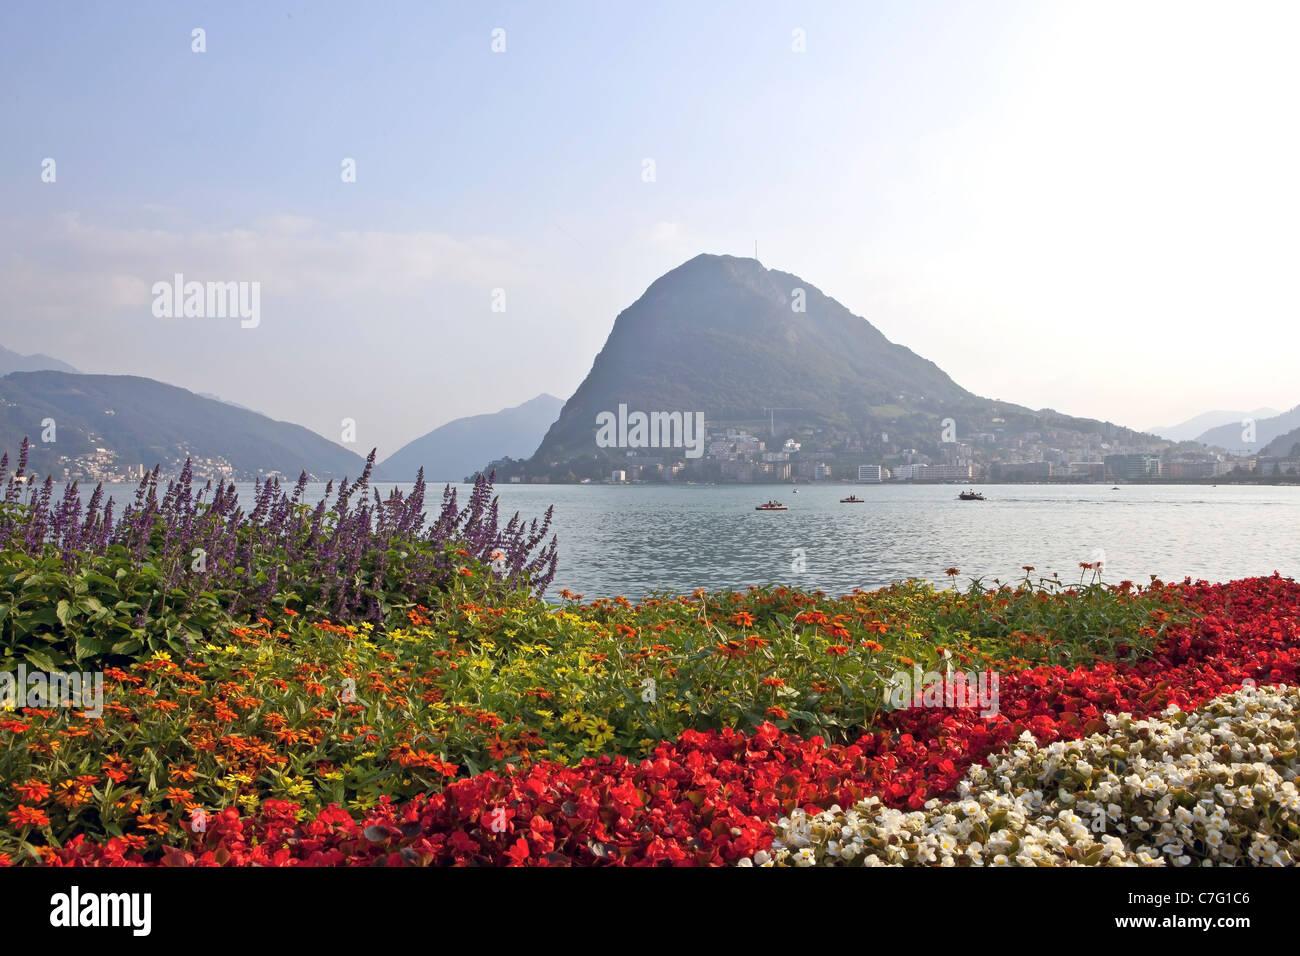 View of Monte Salvatore Parco Civico Lugano - Stock Image